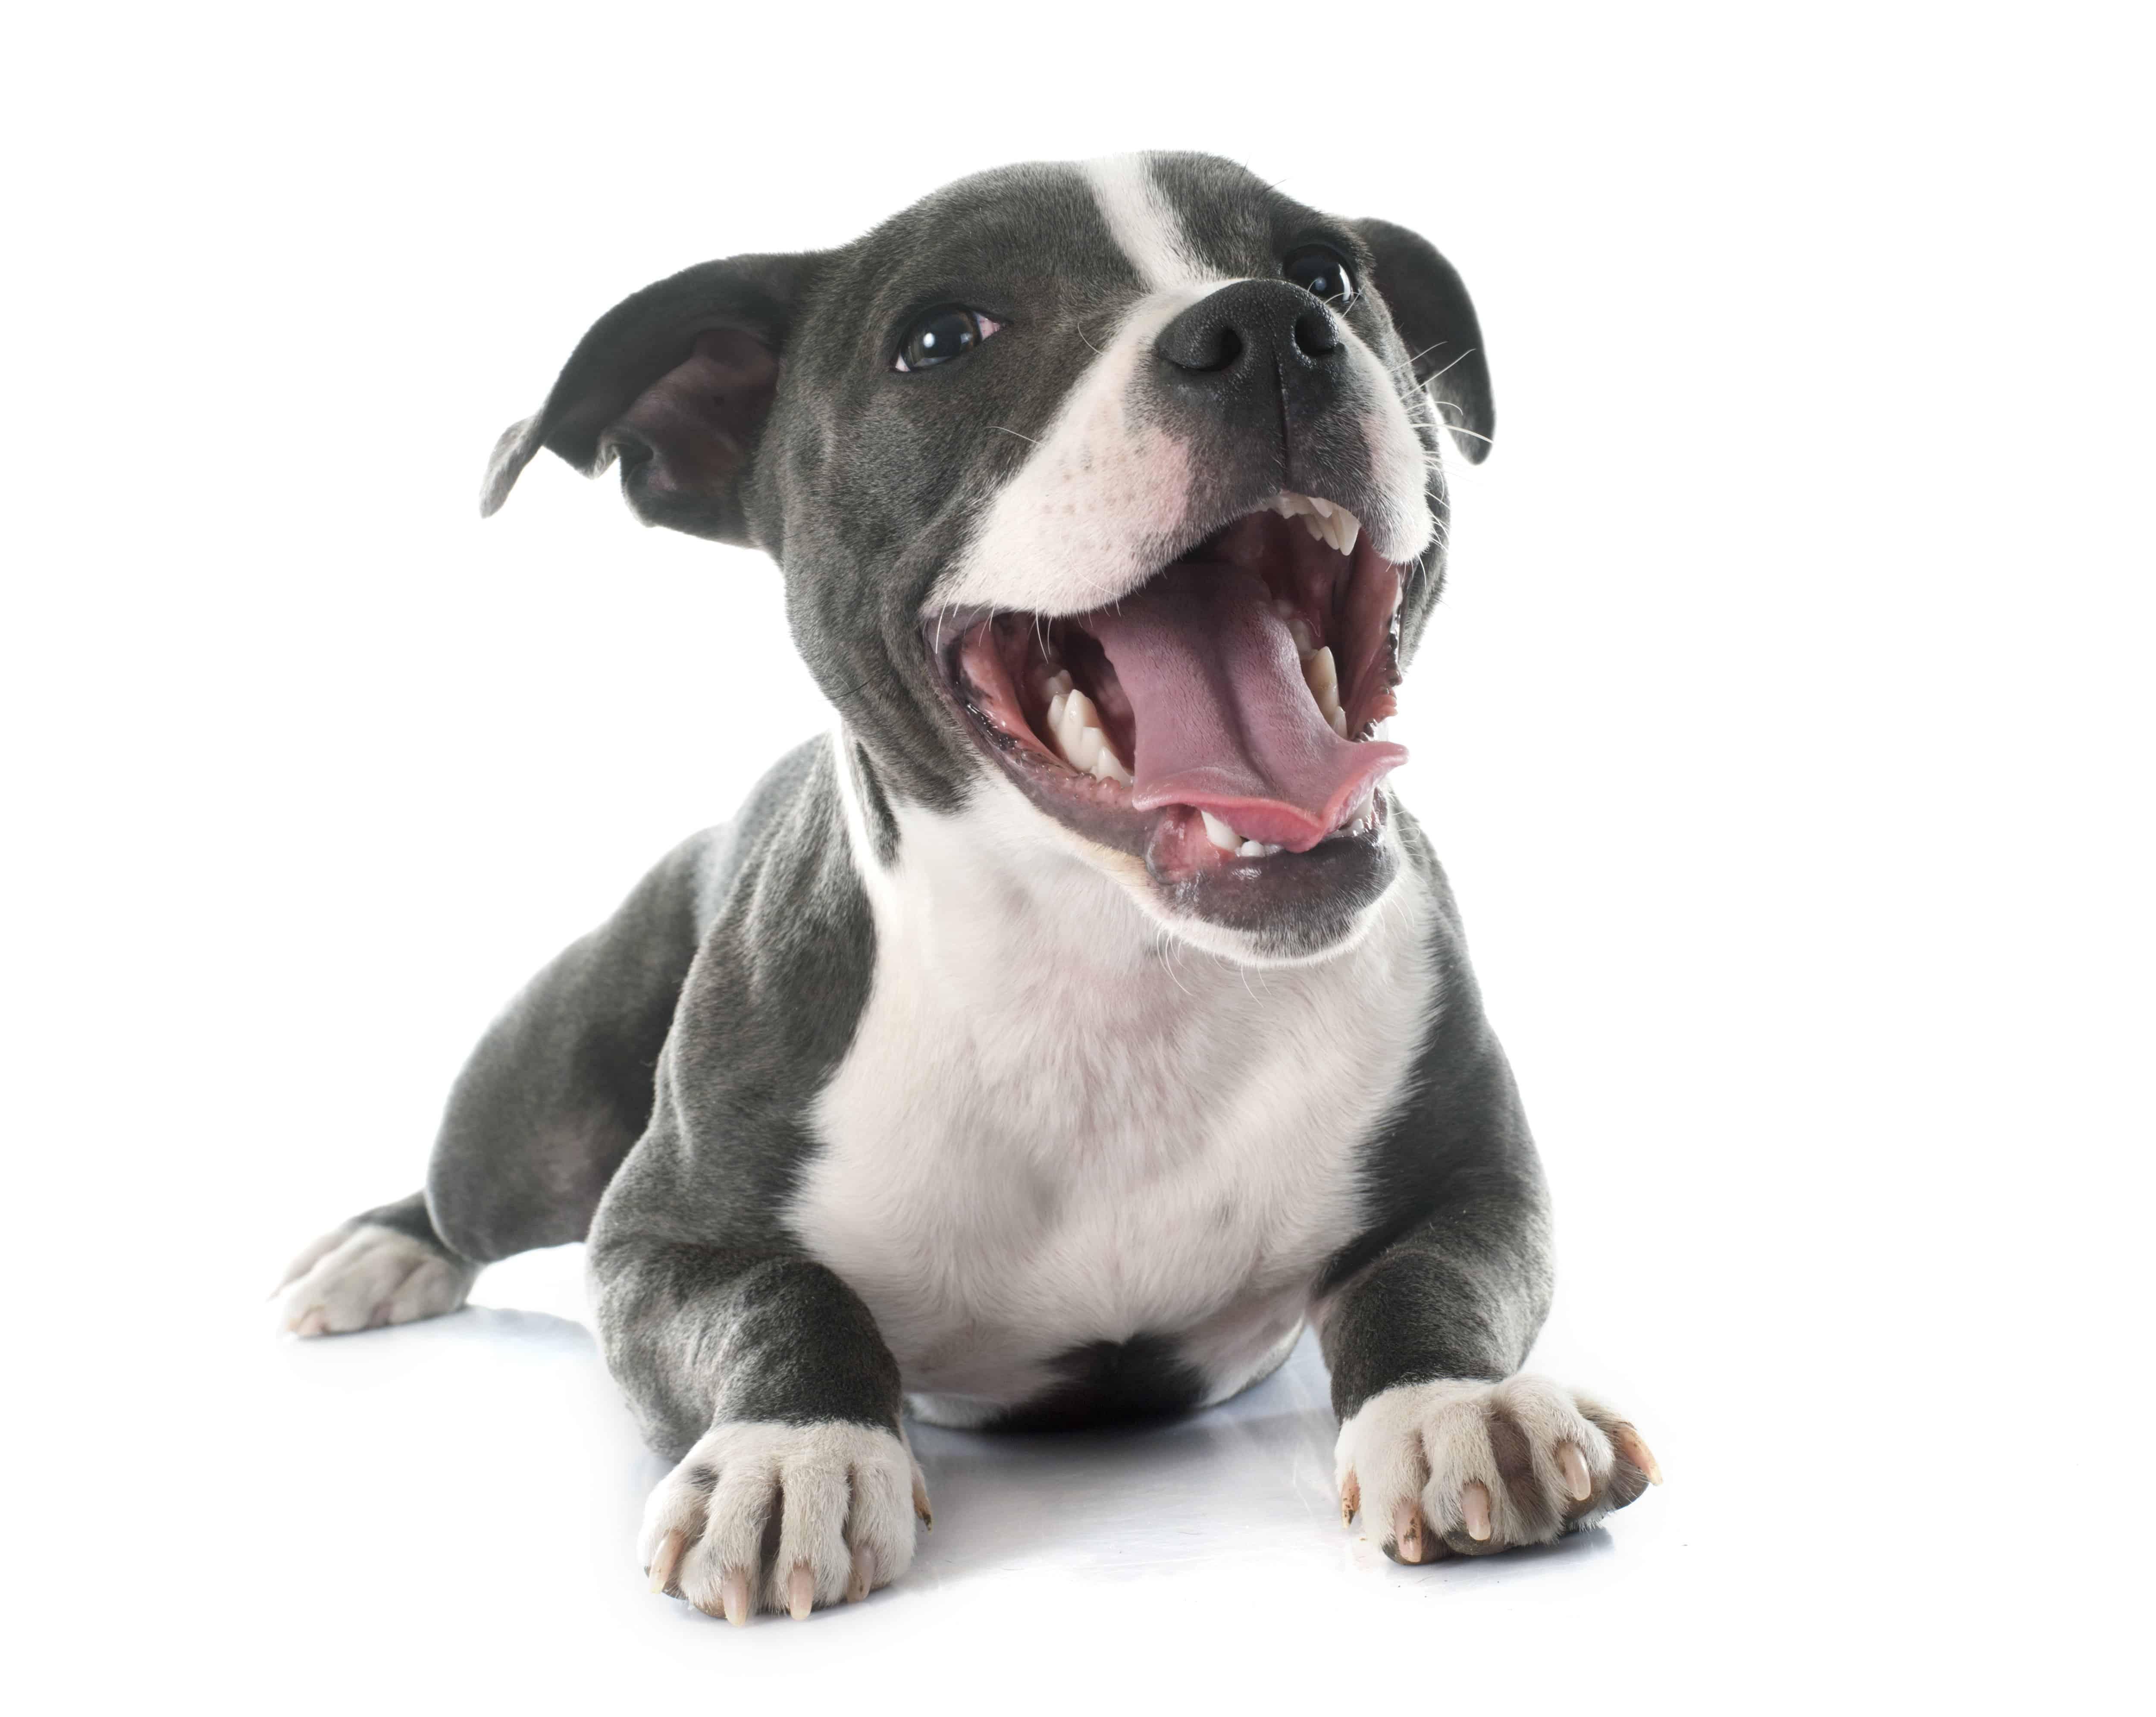 Pet Empowerment Pledge